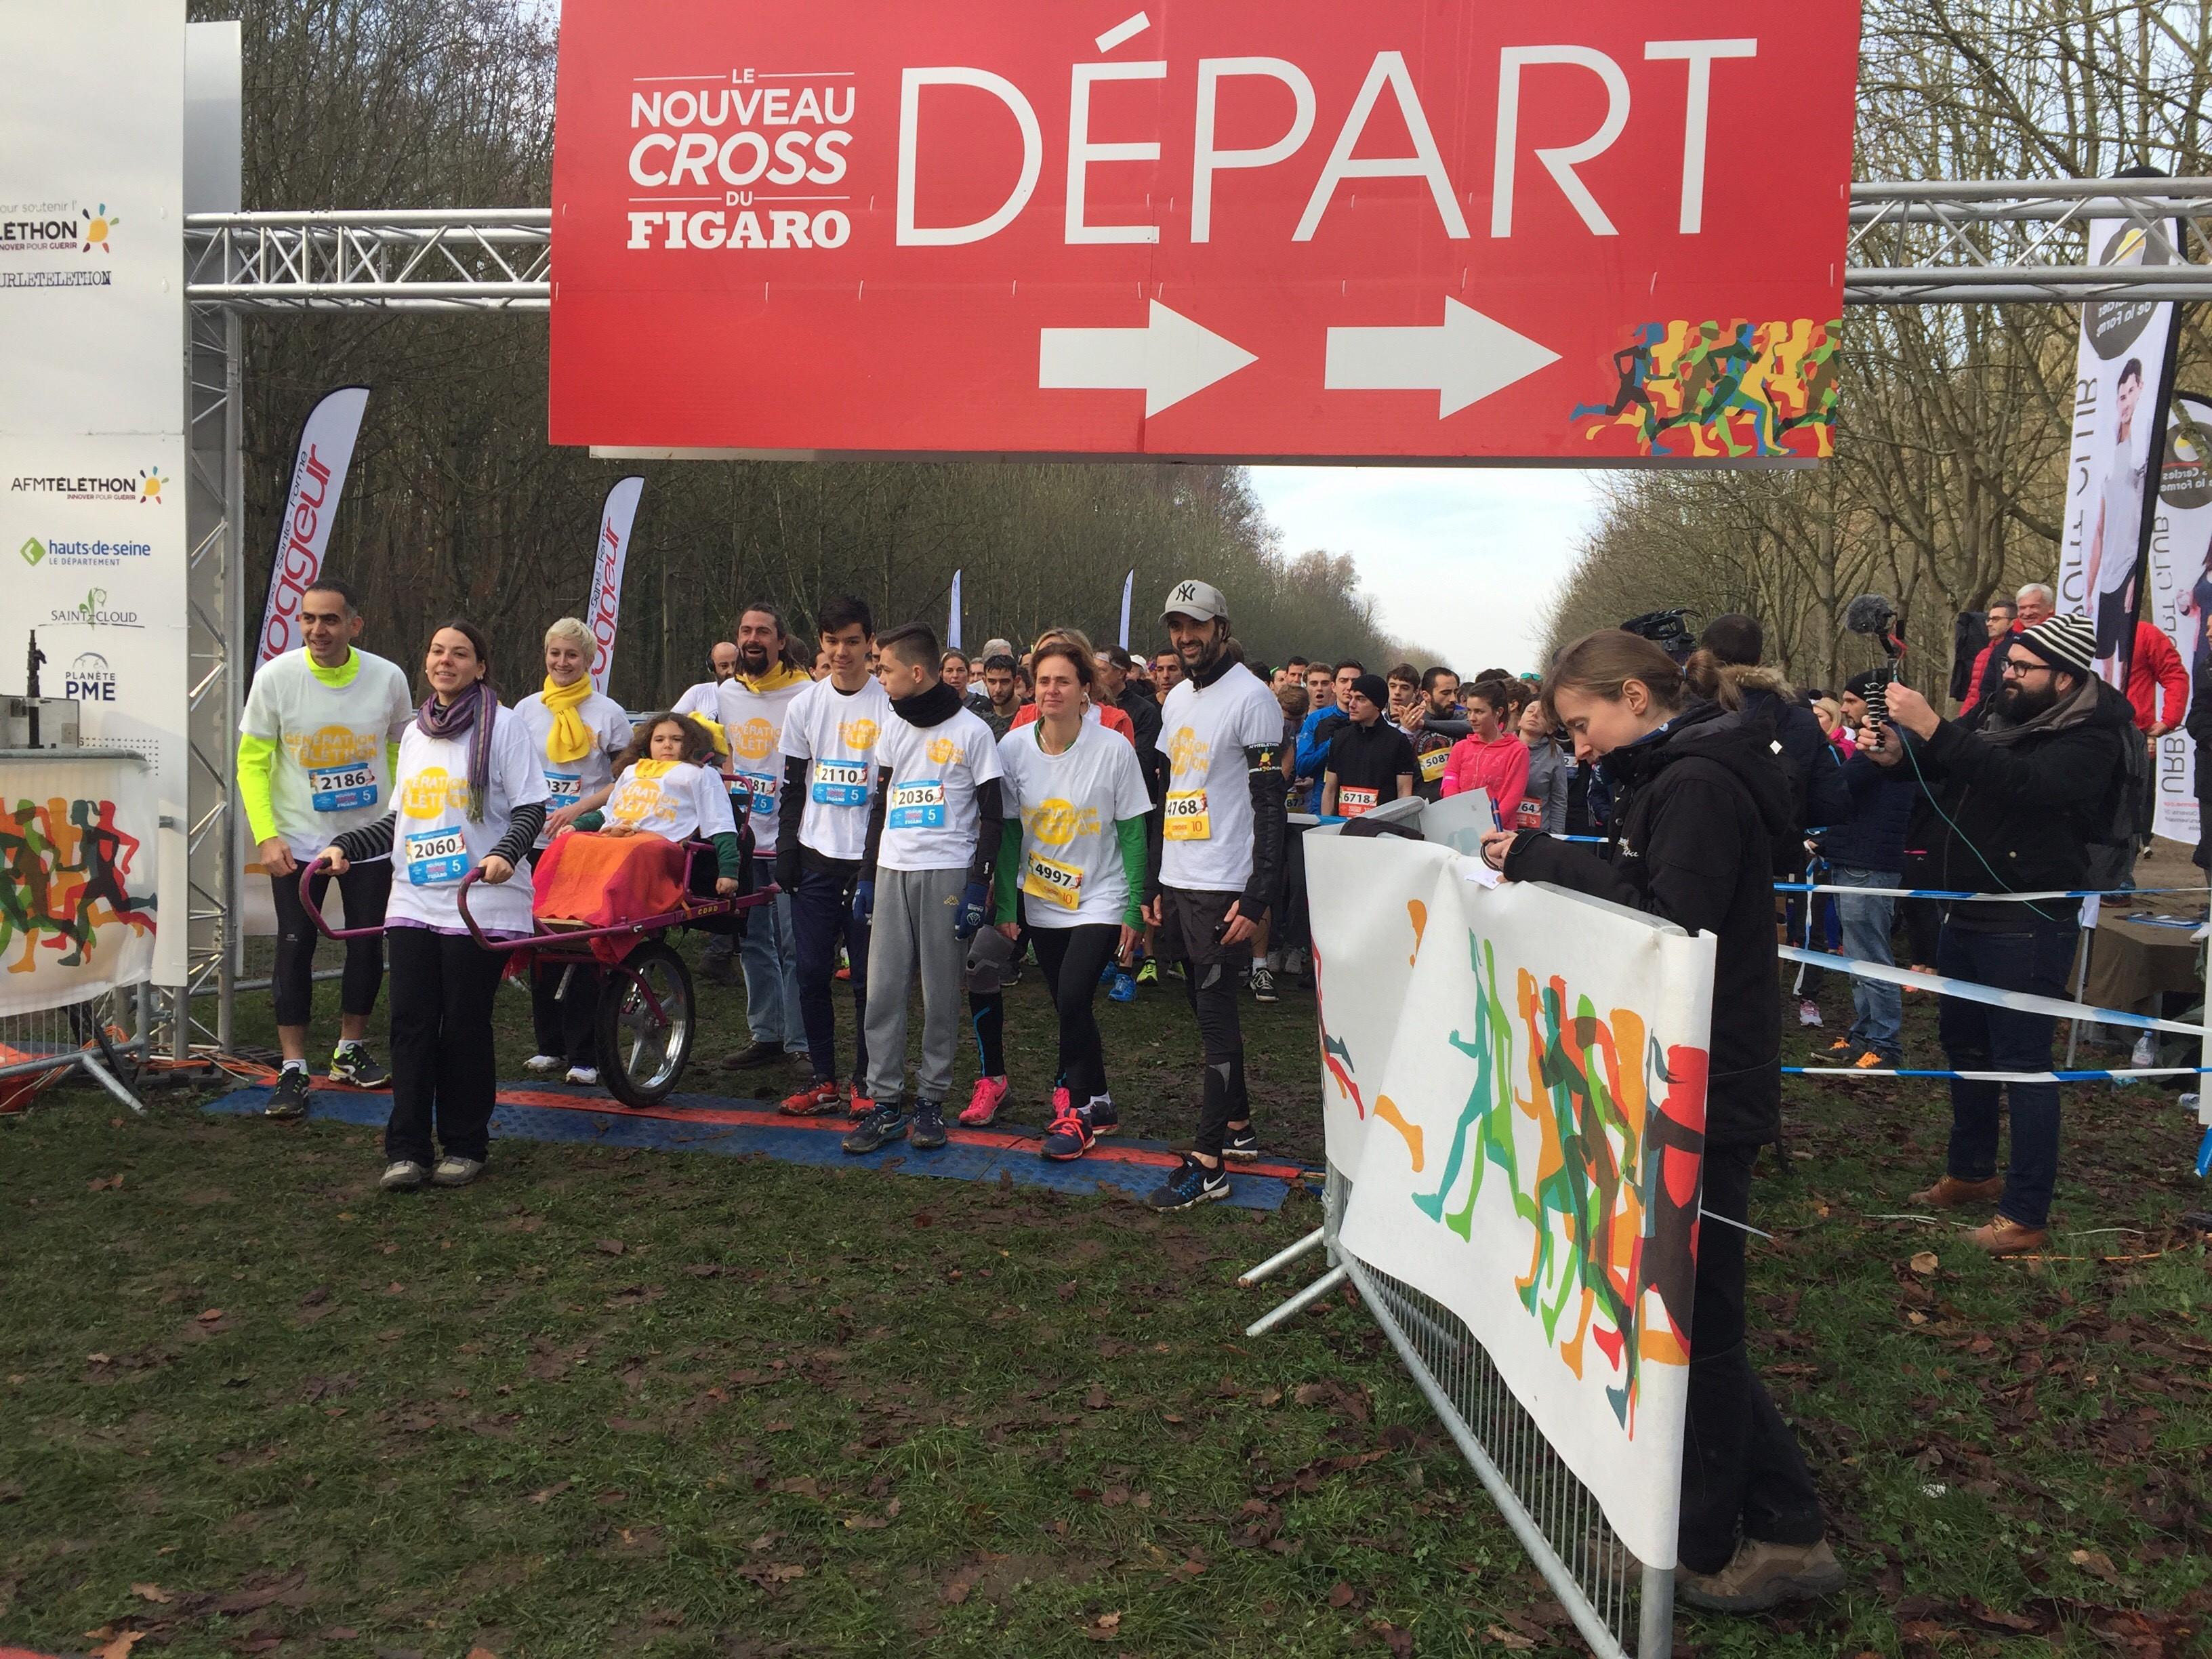 Athlétisme - Running - Un cross du Figaro plus solidaire que jamais